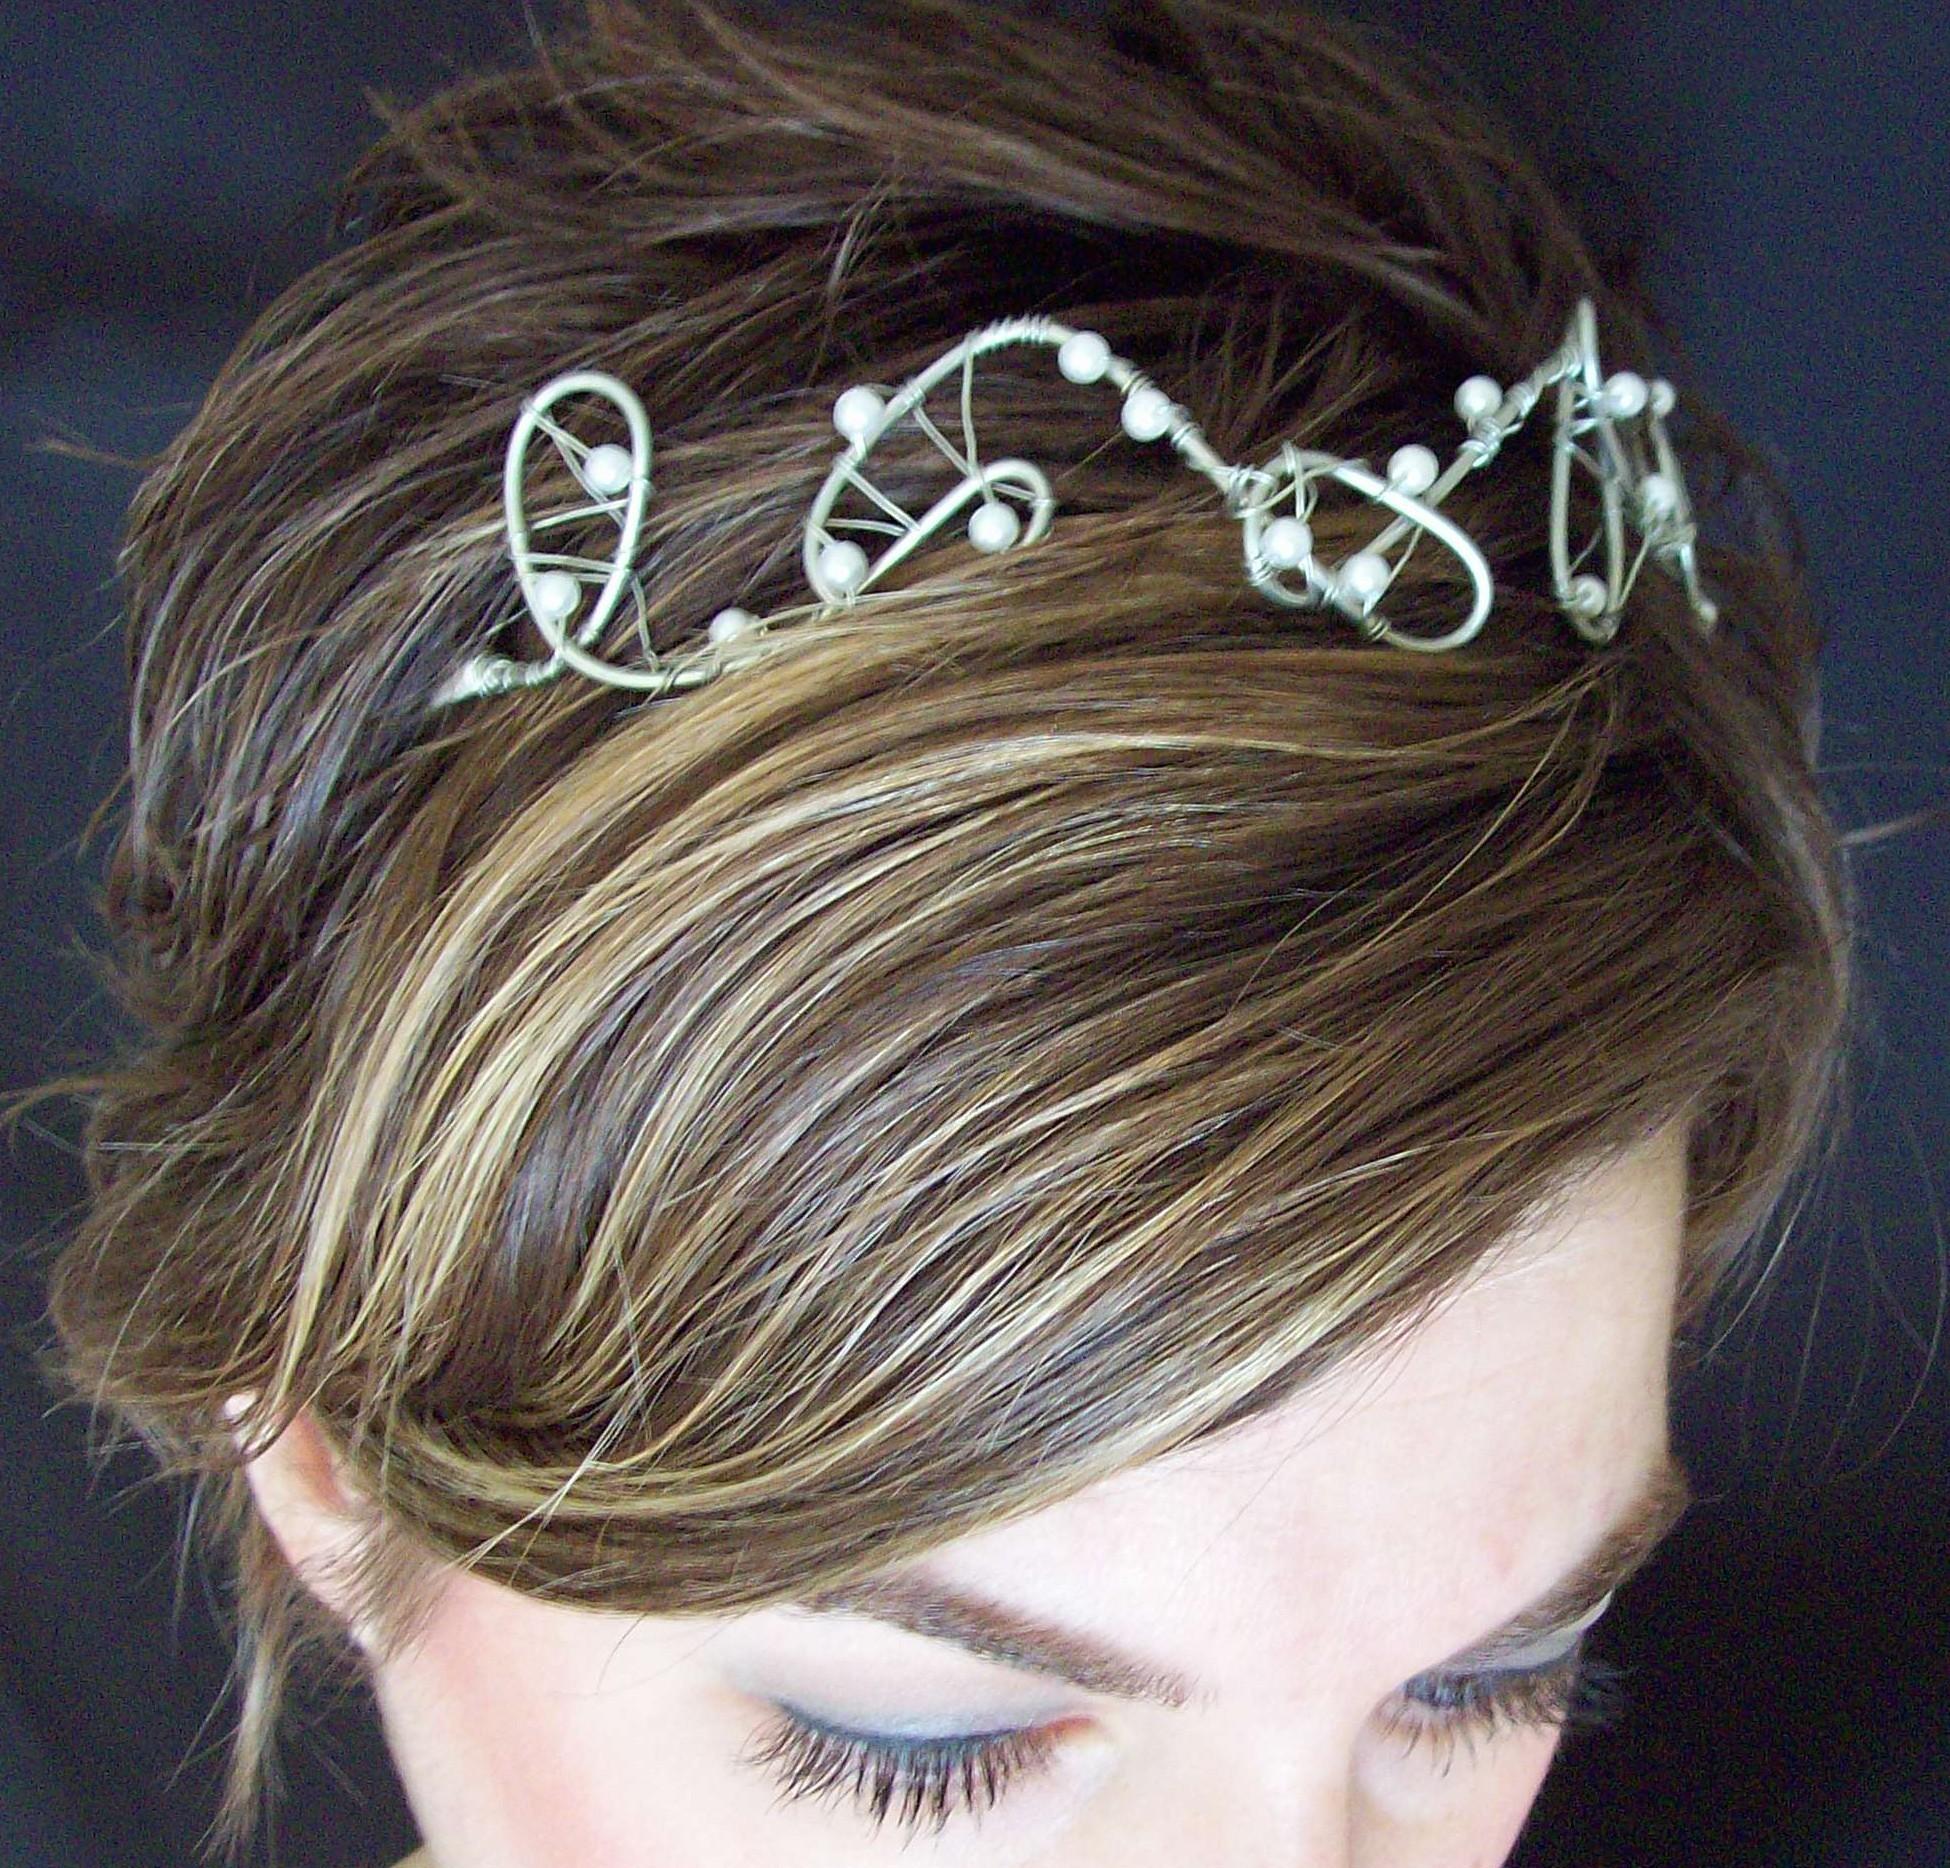 Beauty, Jewelry, white, silver, Tiaras, Hair, Tiara, Pearls, Headpiece, Handmade, Megan hamilton weddings